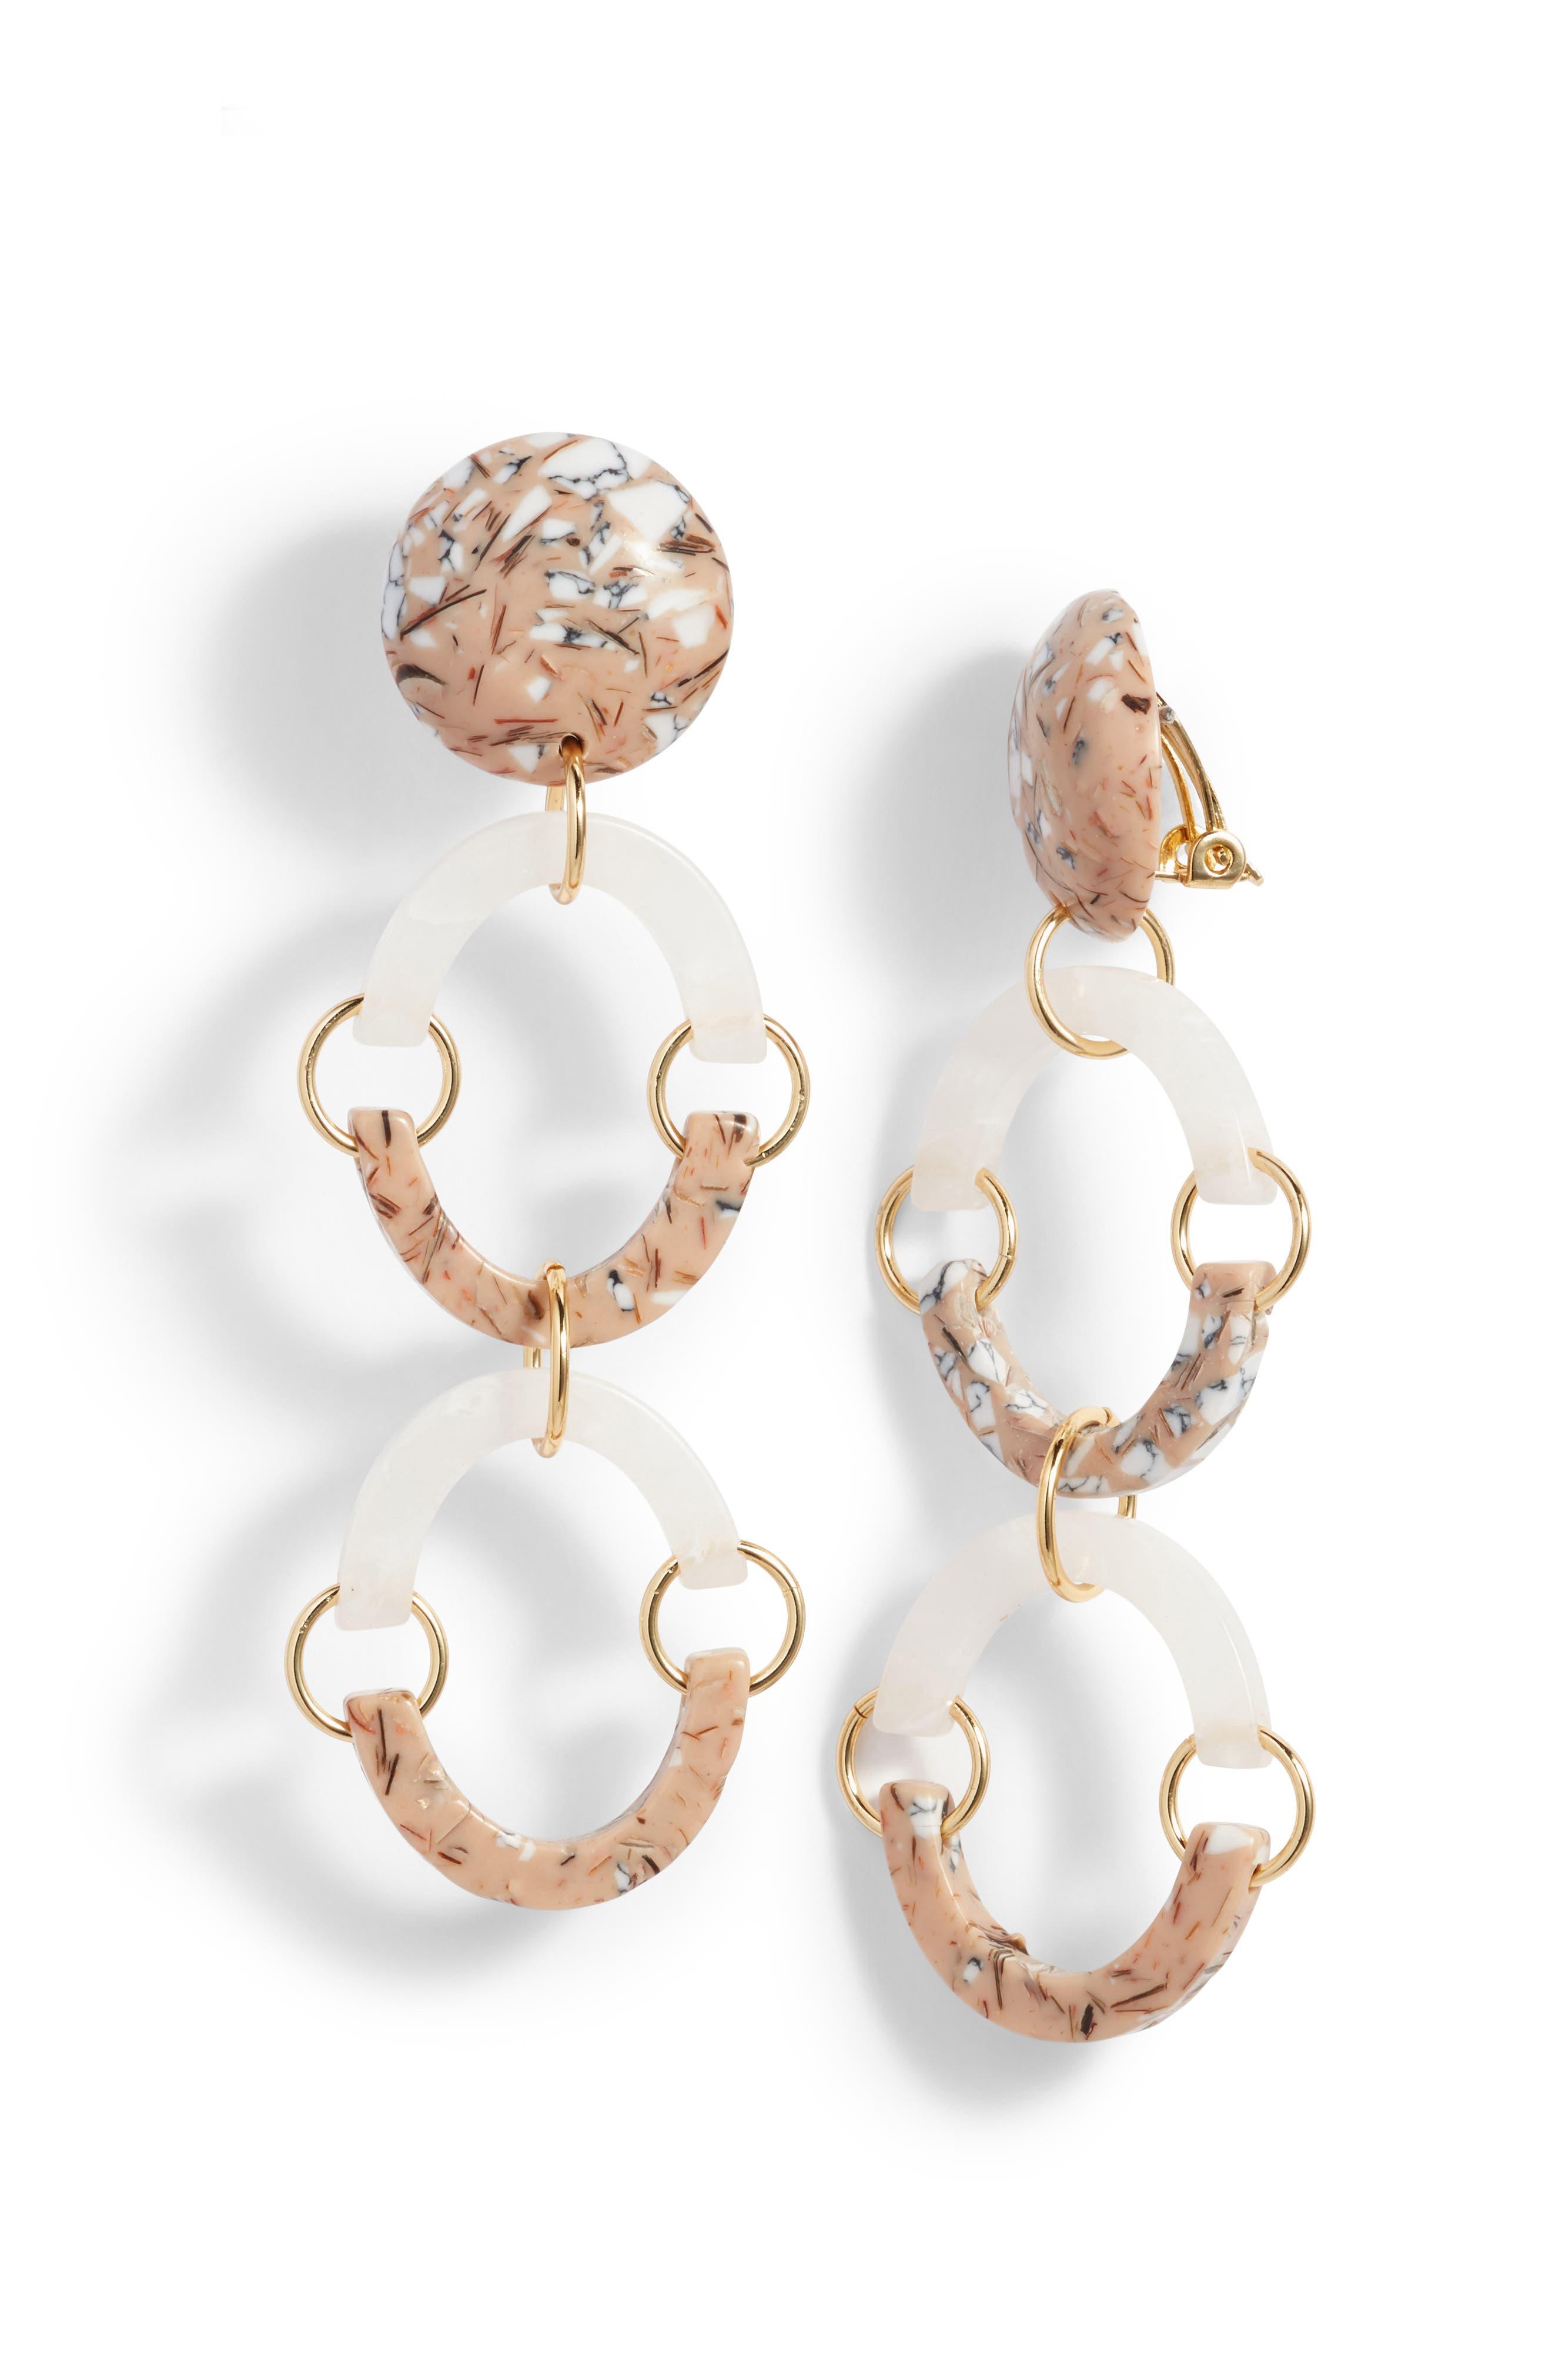 Confetti Rainbow Arch Clip Drop Earrings,                             Main thumbnail 1, color,                             ROSE QUARTZ